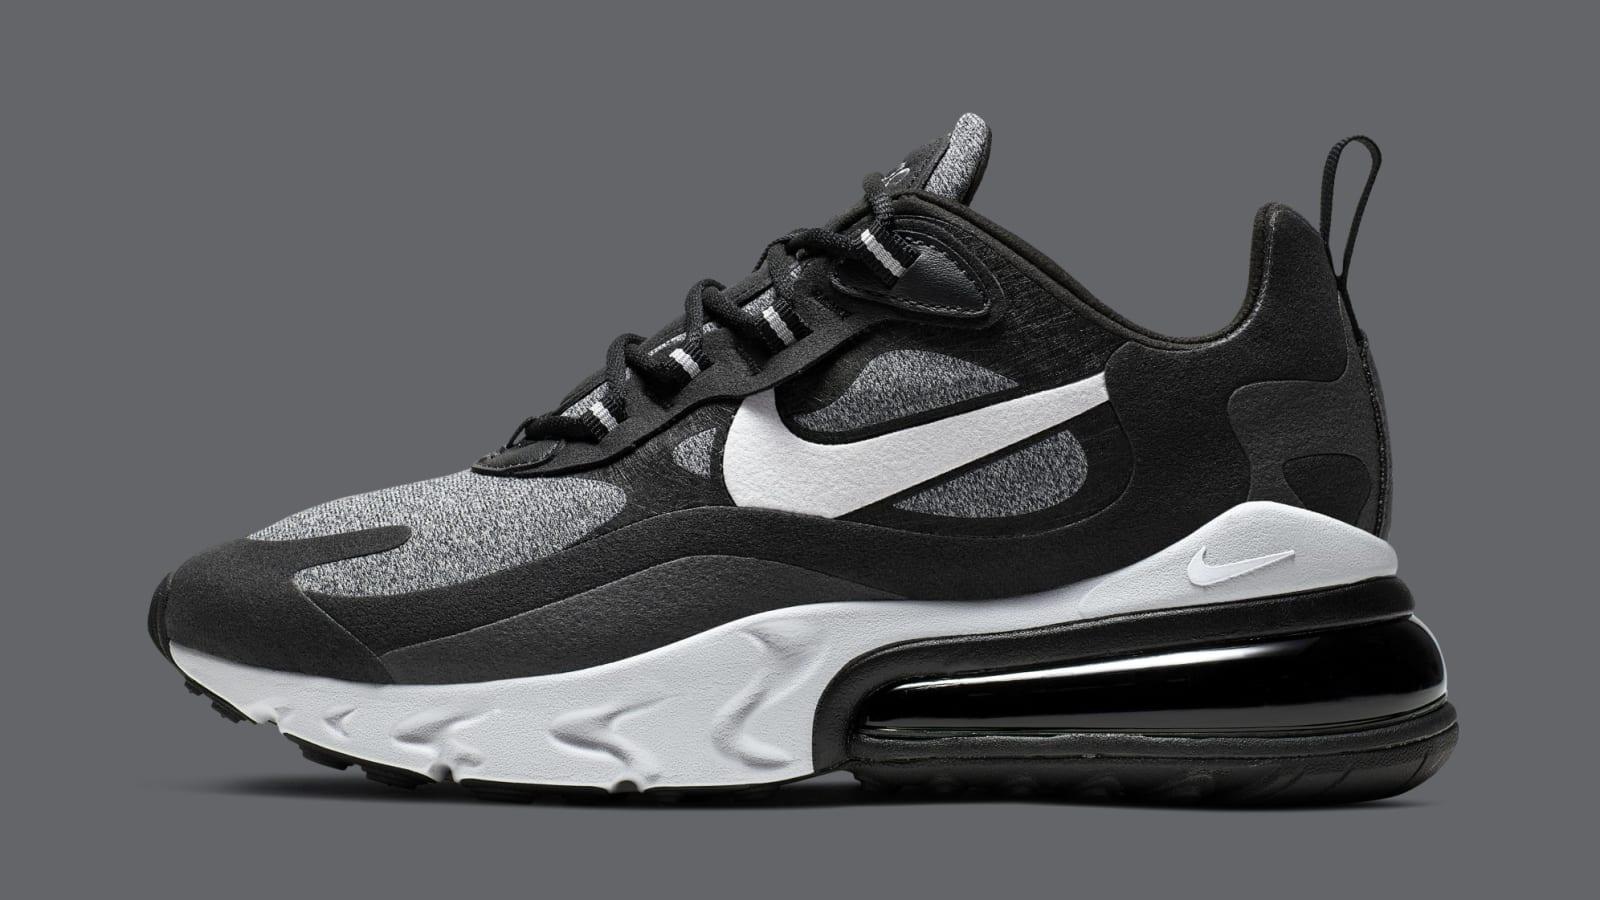 Nike air max 270 react Enfants Chaussures Foot Locker